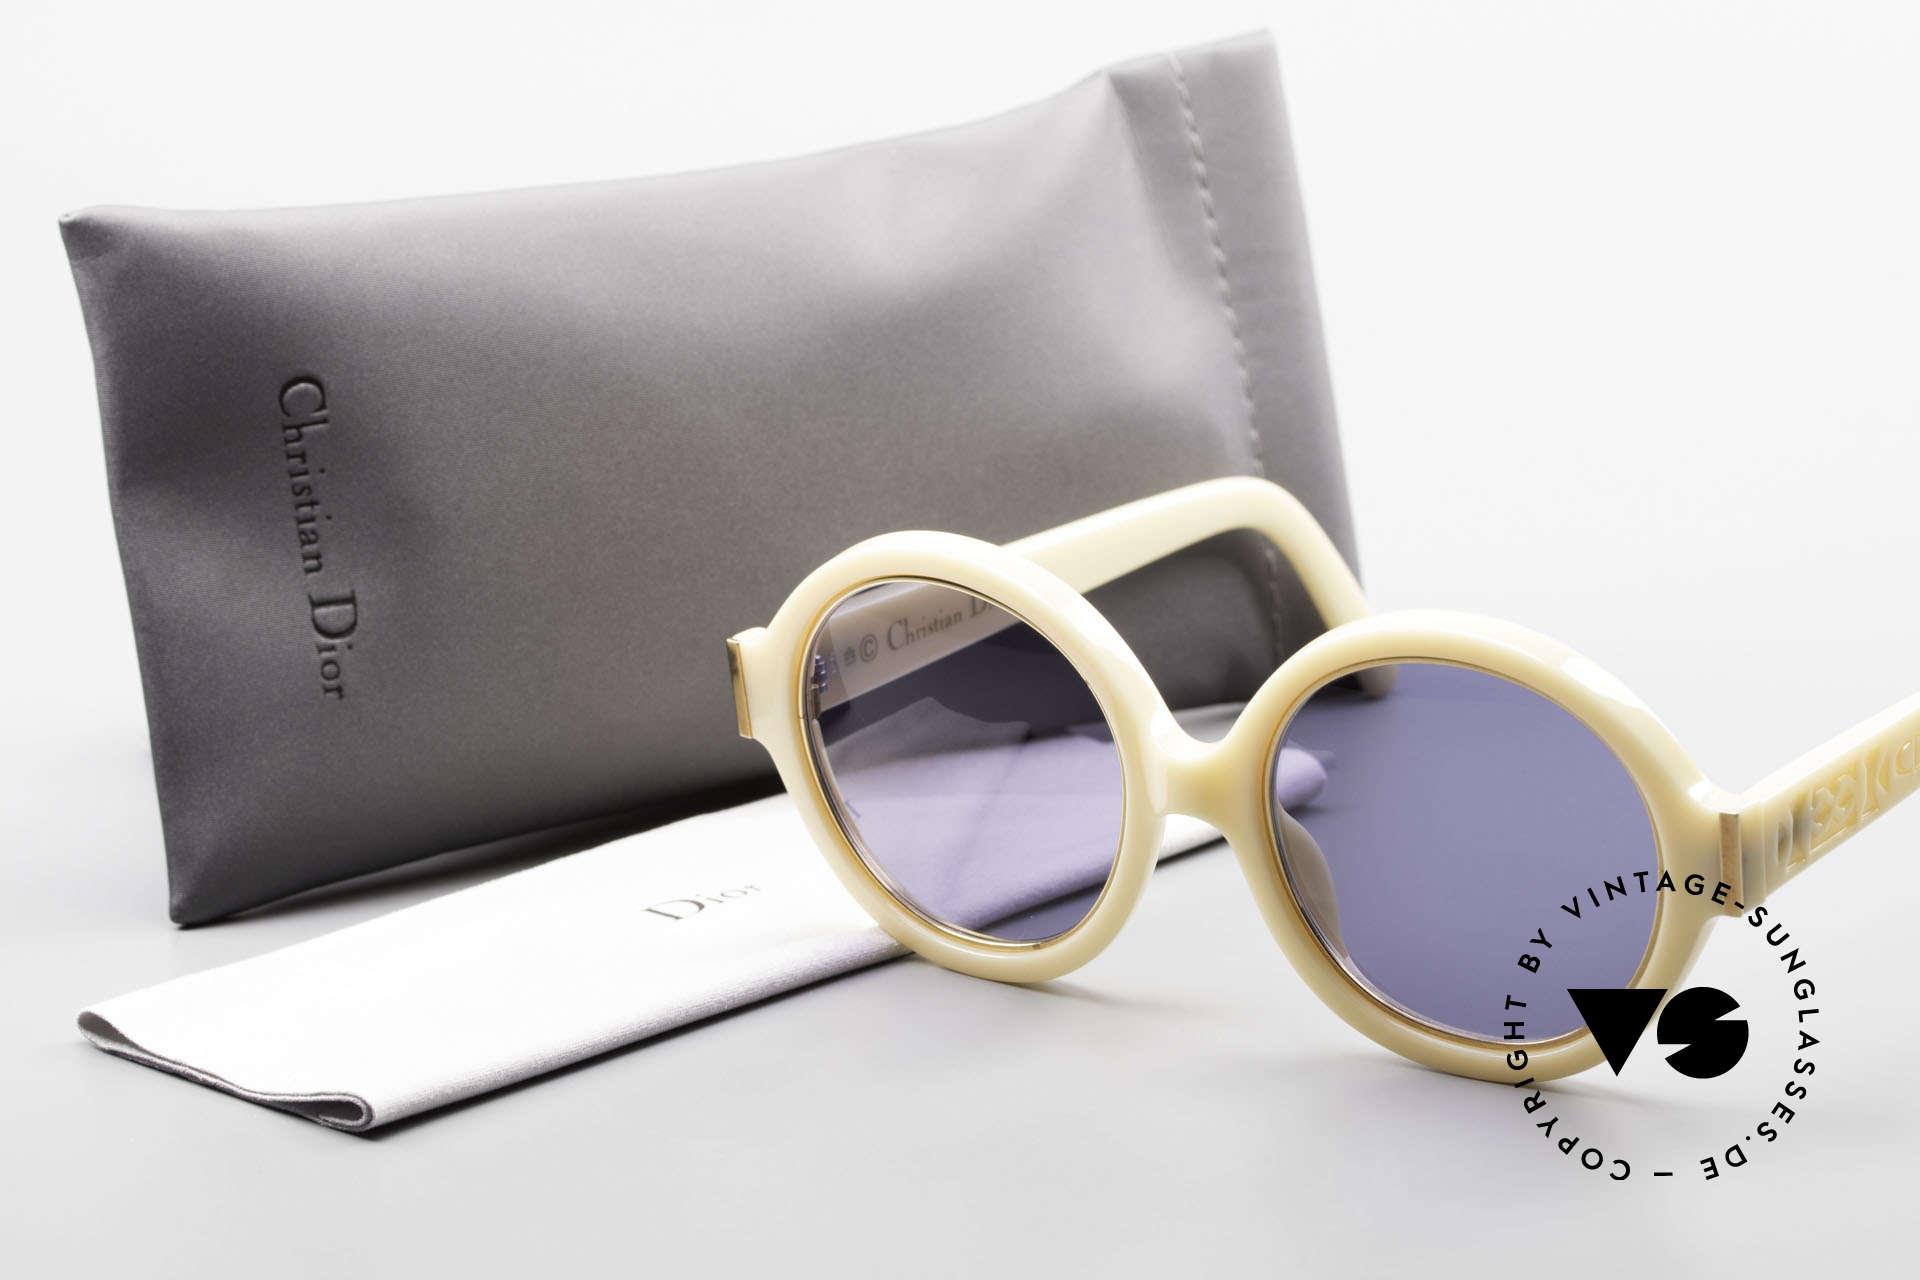 Christian Dior 2446 Round Ladies 80's Sunglasses, Size: medium, Made for Women